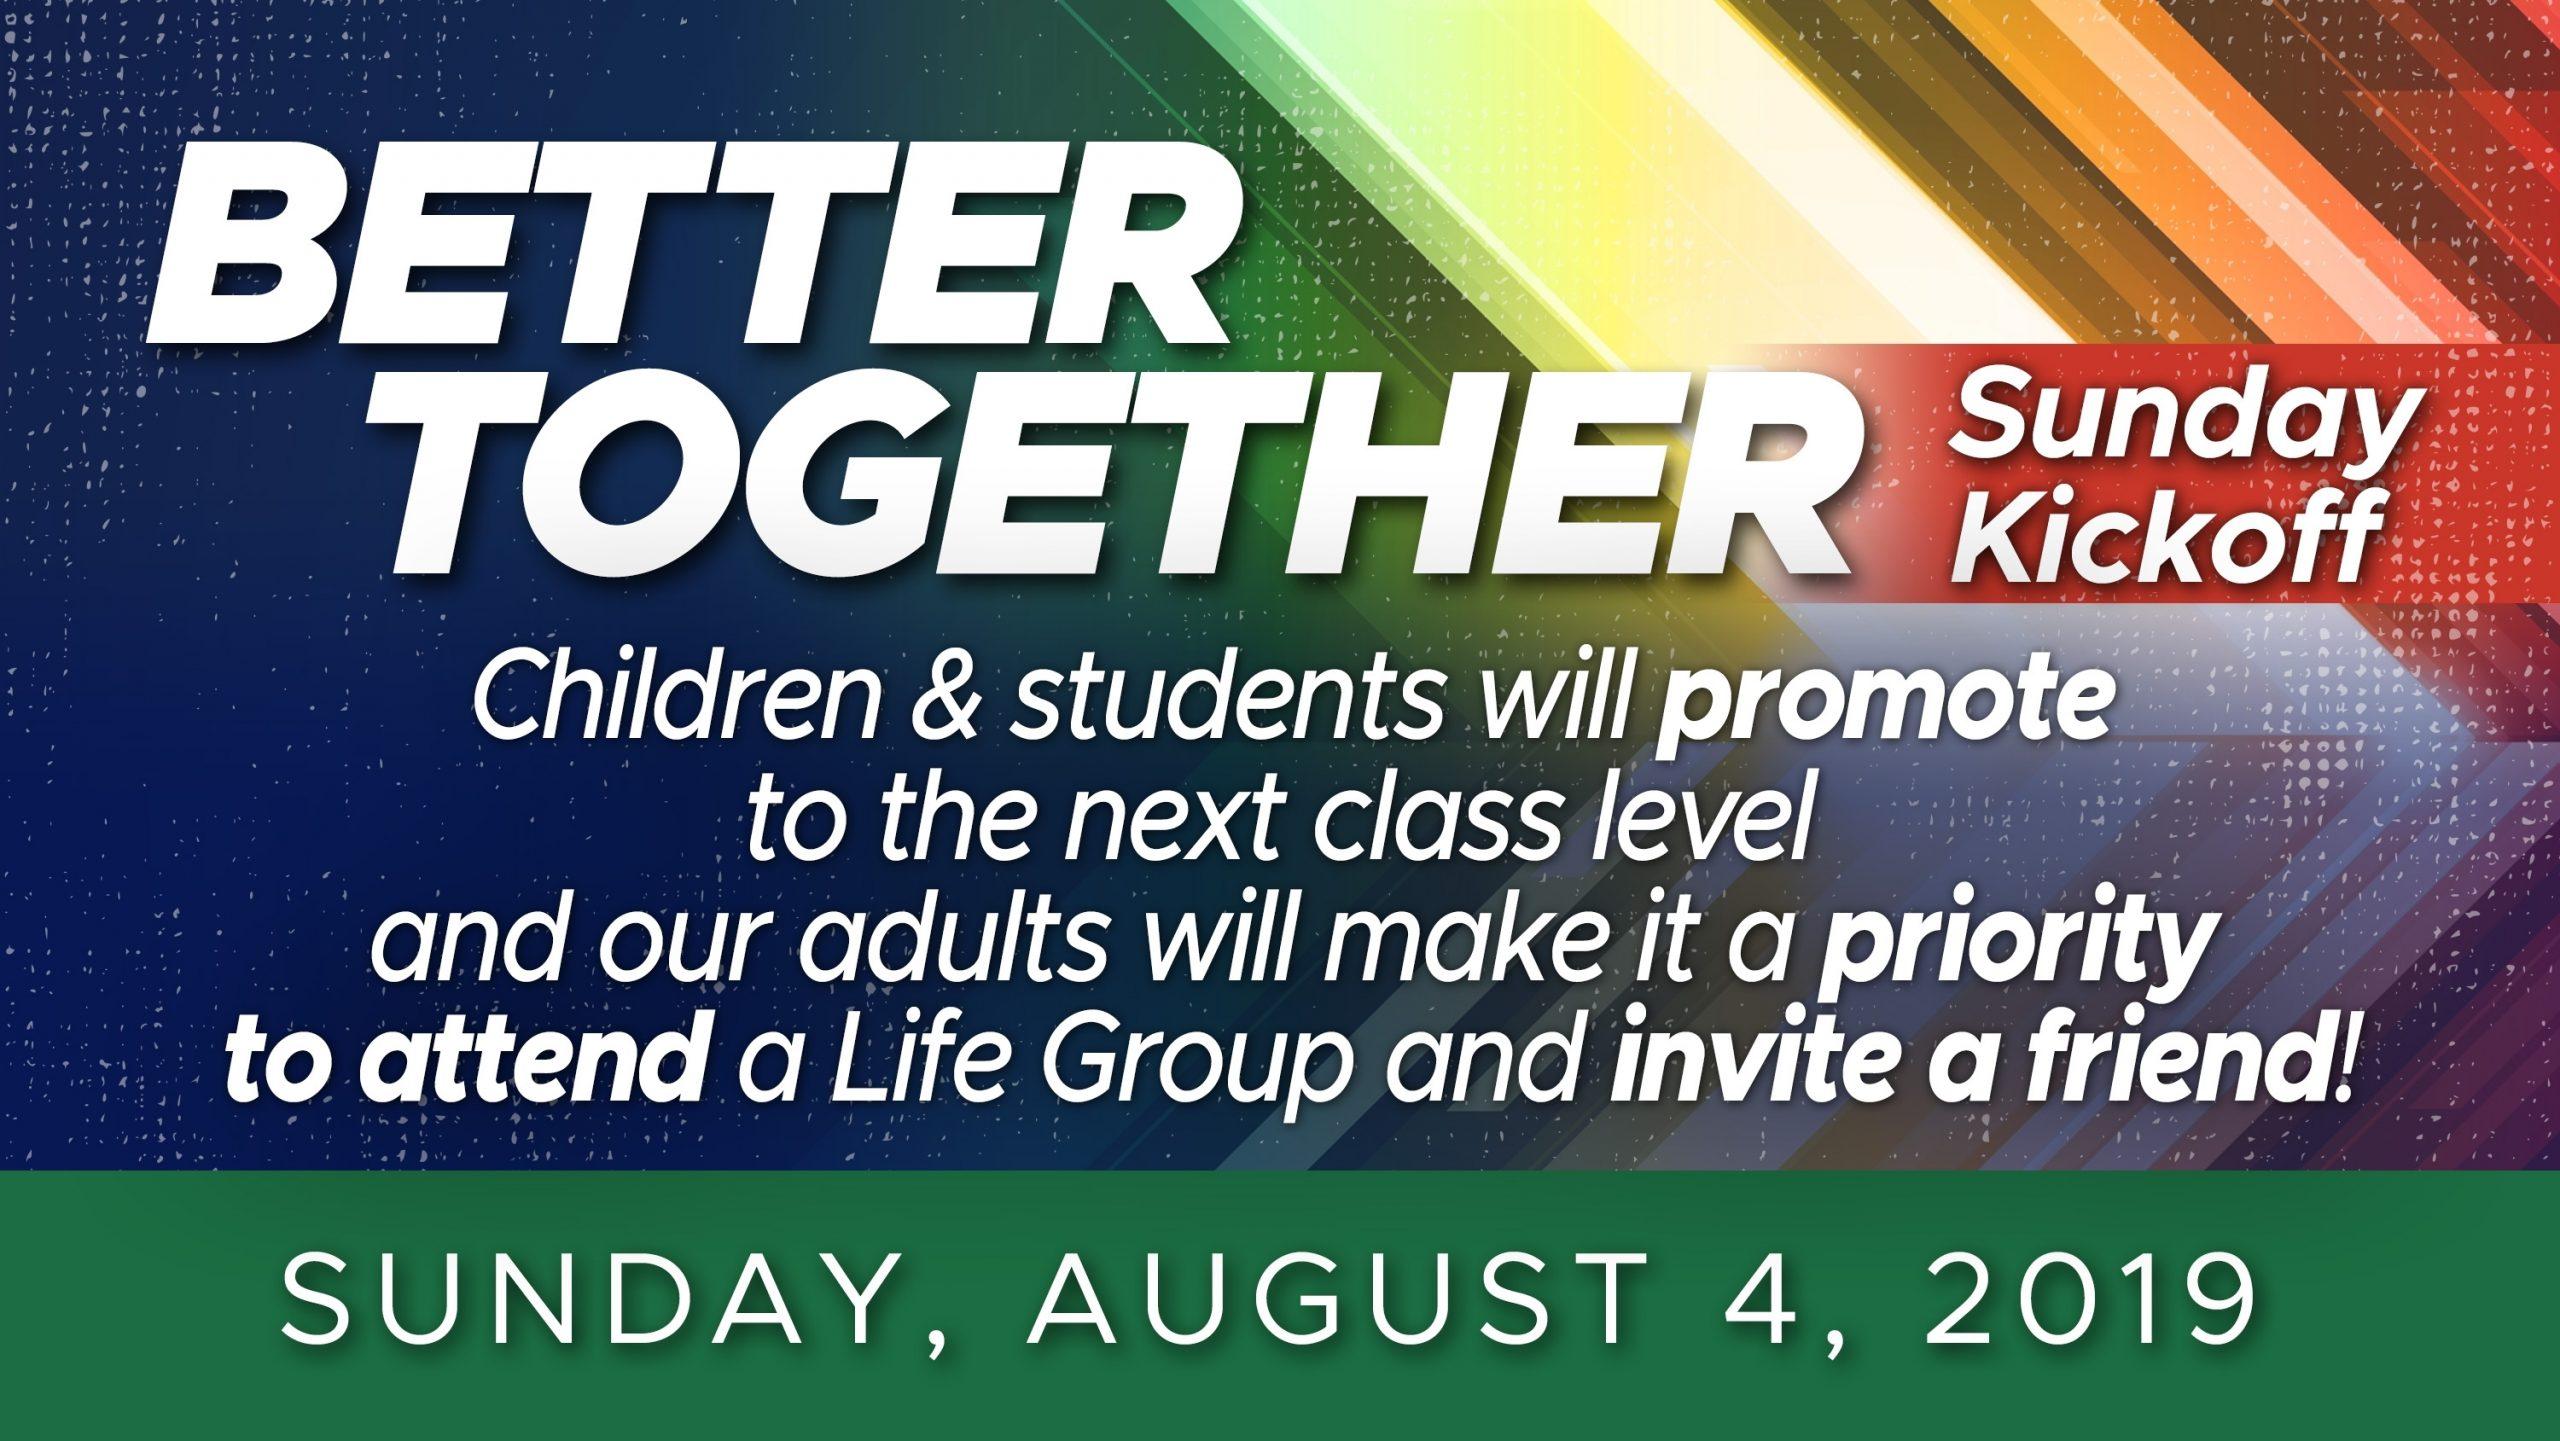 Central Baptist Church: Warner Robins, Ga > Better Together Sunday Kickoff!